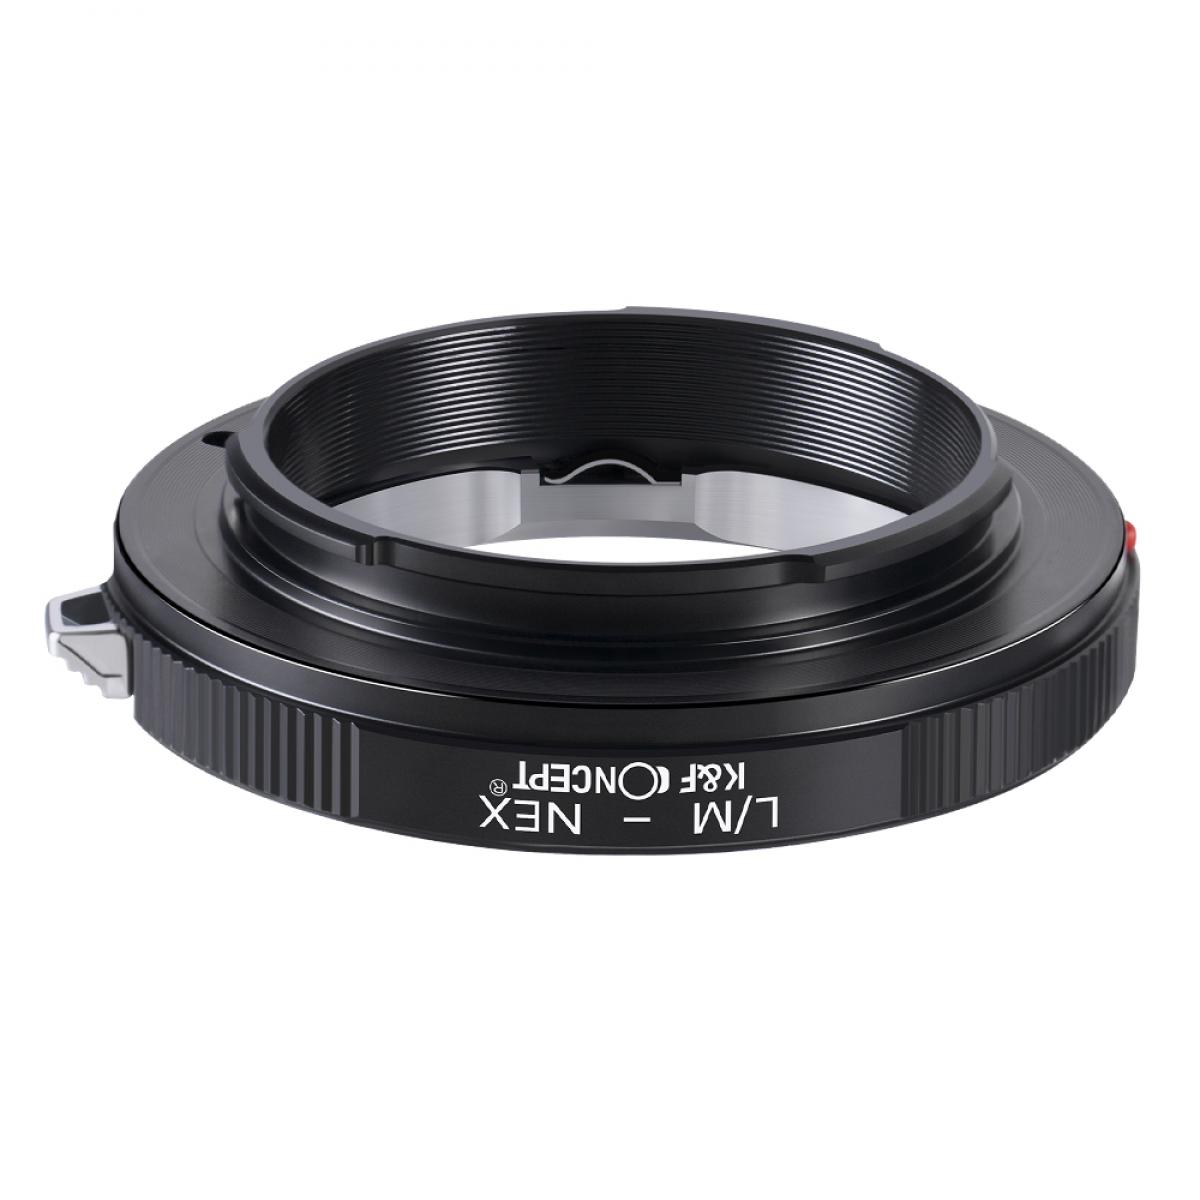 K&F M20101 Bague Adaptation Objectif Leica M vers Sony E Mount Appareil Photo